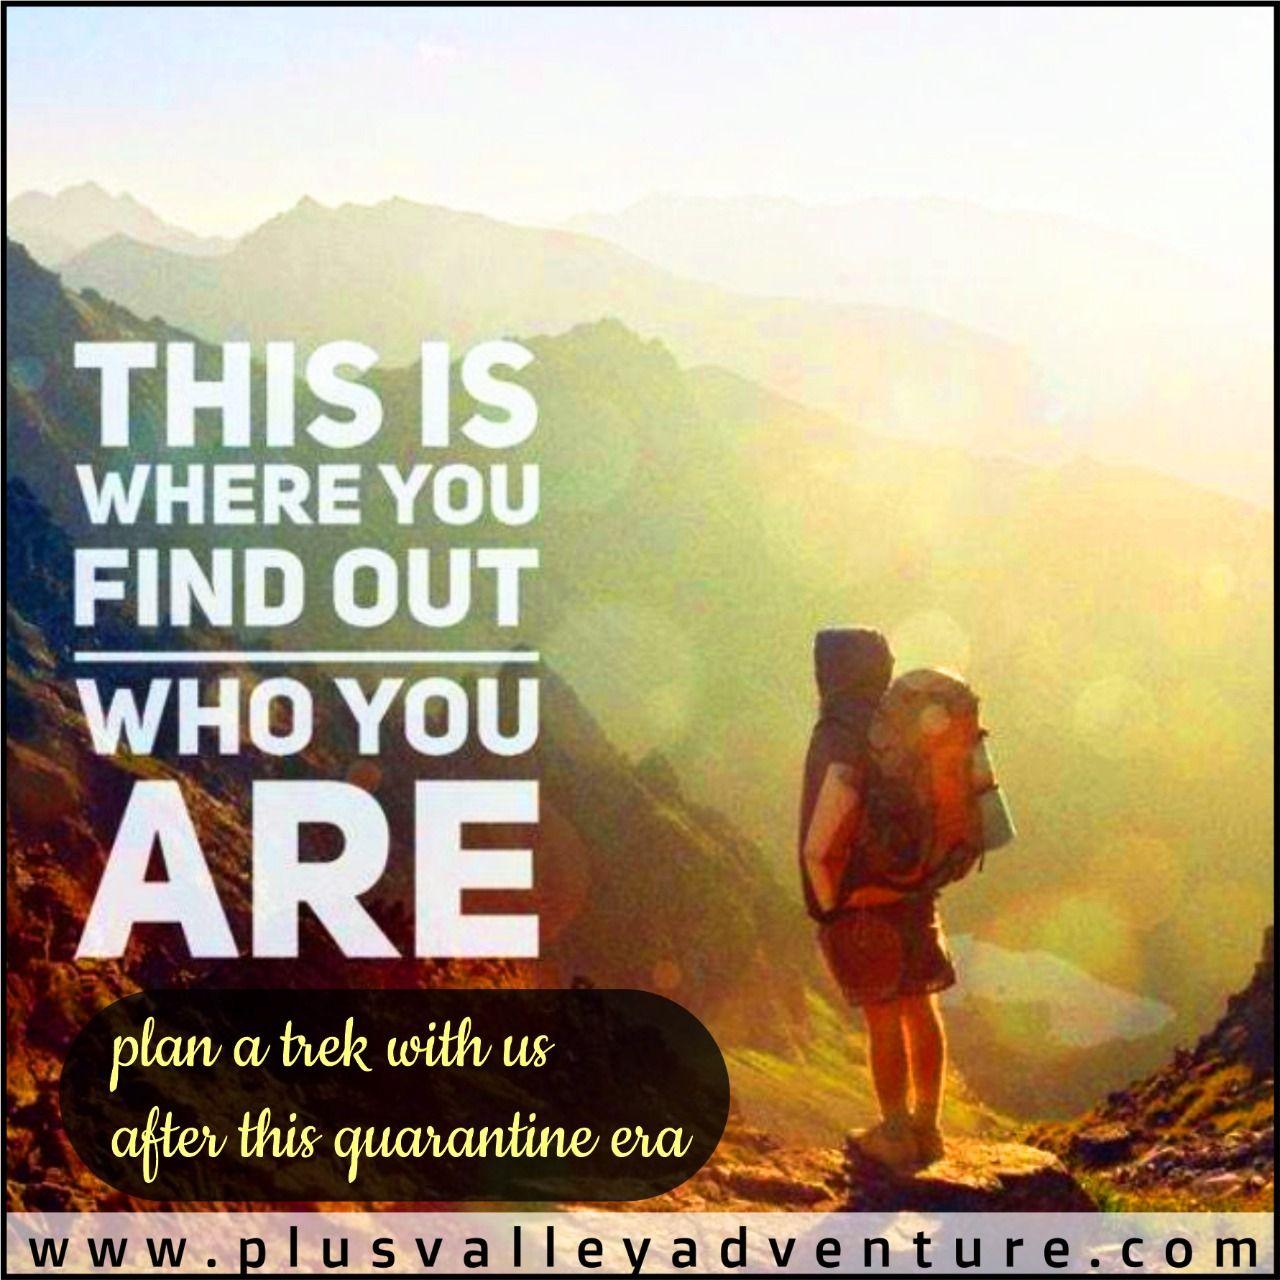 #stayhome #staysafe #besafe #trekker #trek #nature #tourism #sahyadri #maharashtra_forts #fitness #motivation #lifestyle #travelgrams  #adventure #trekking #trekkersofindia #trekkinglife #maharashtra #pune #punetrekker #travel #naturephotography #outdoors #camping #trekmemes #mountainlife #naturelovers